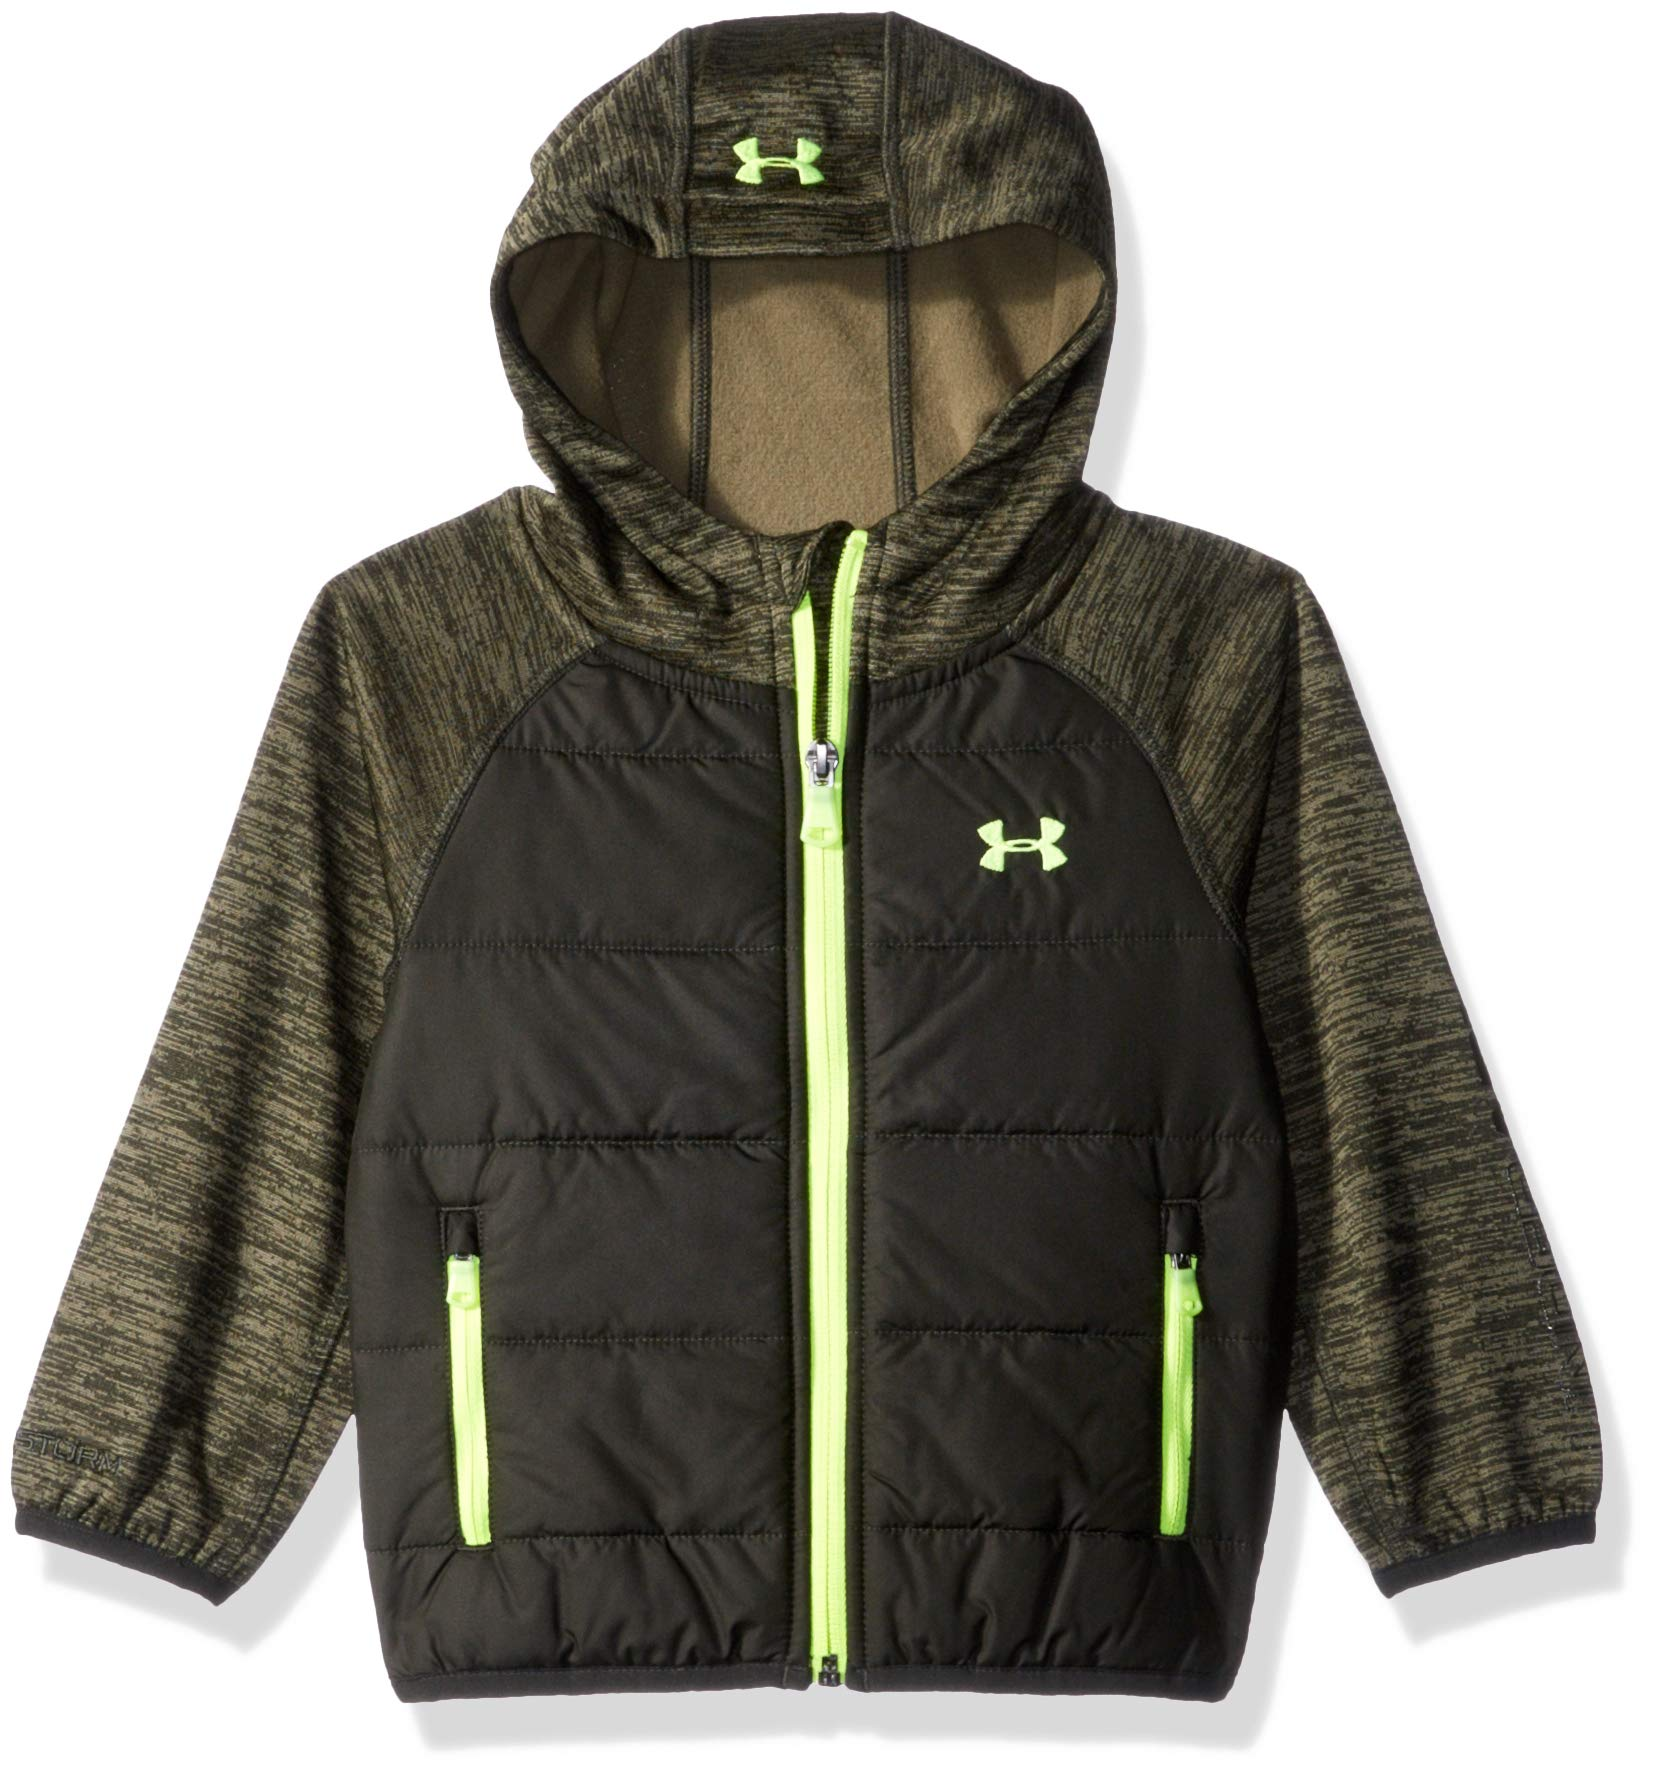 Under Armour Boys' Big' Day Trekker Hooded Hybrid Jacket, Artillery Green, Large (14/16)